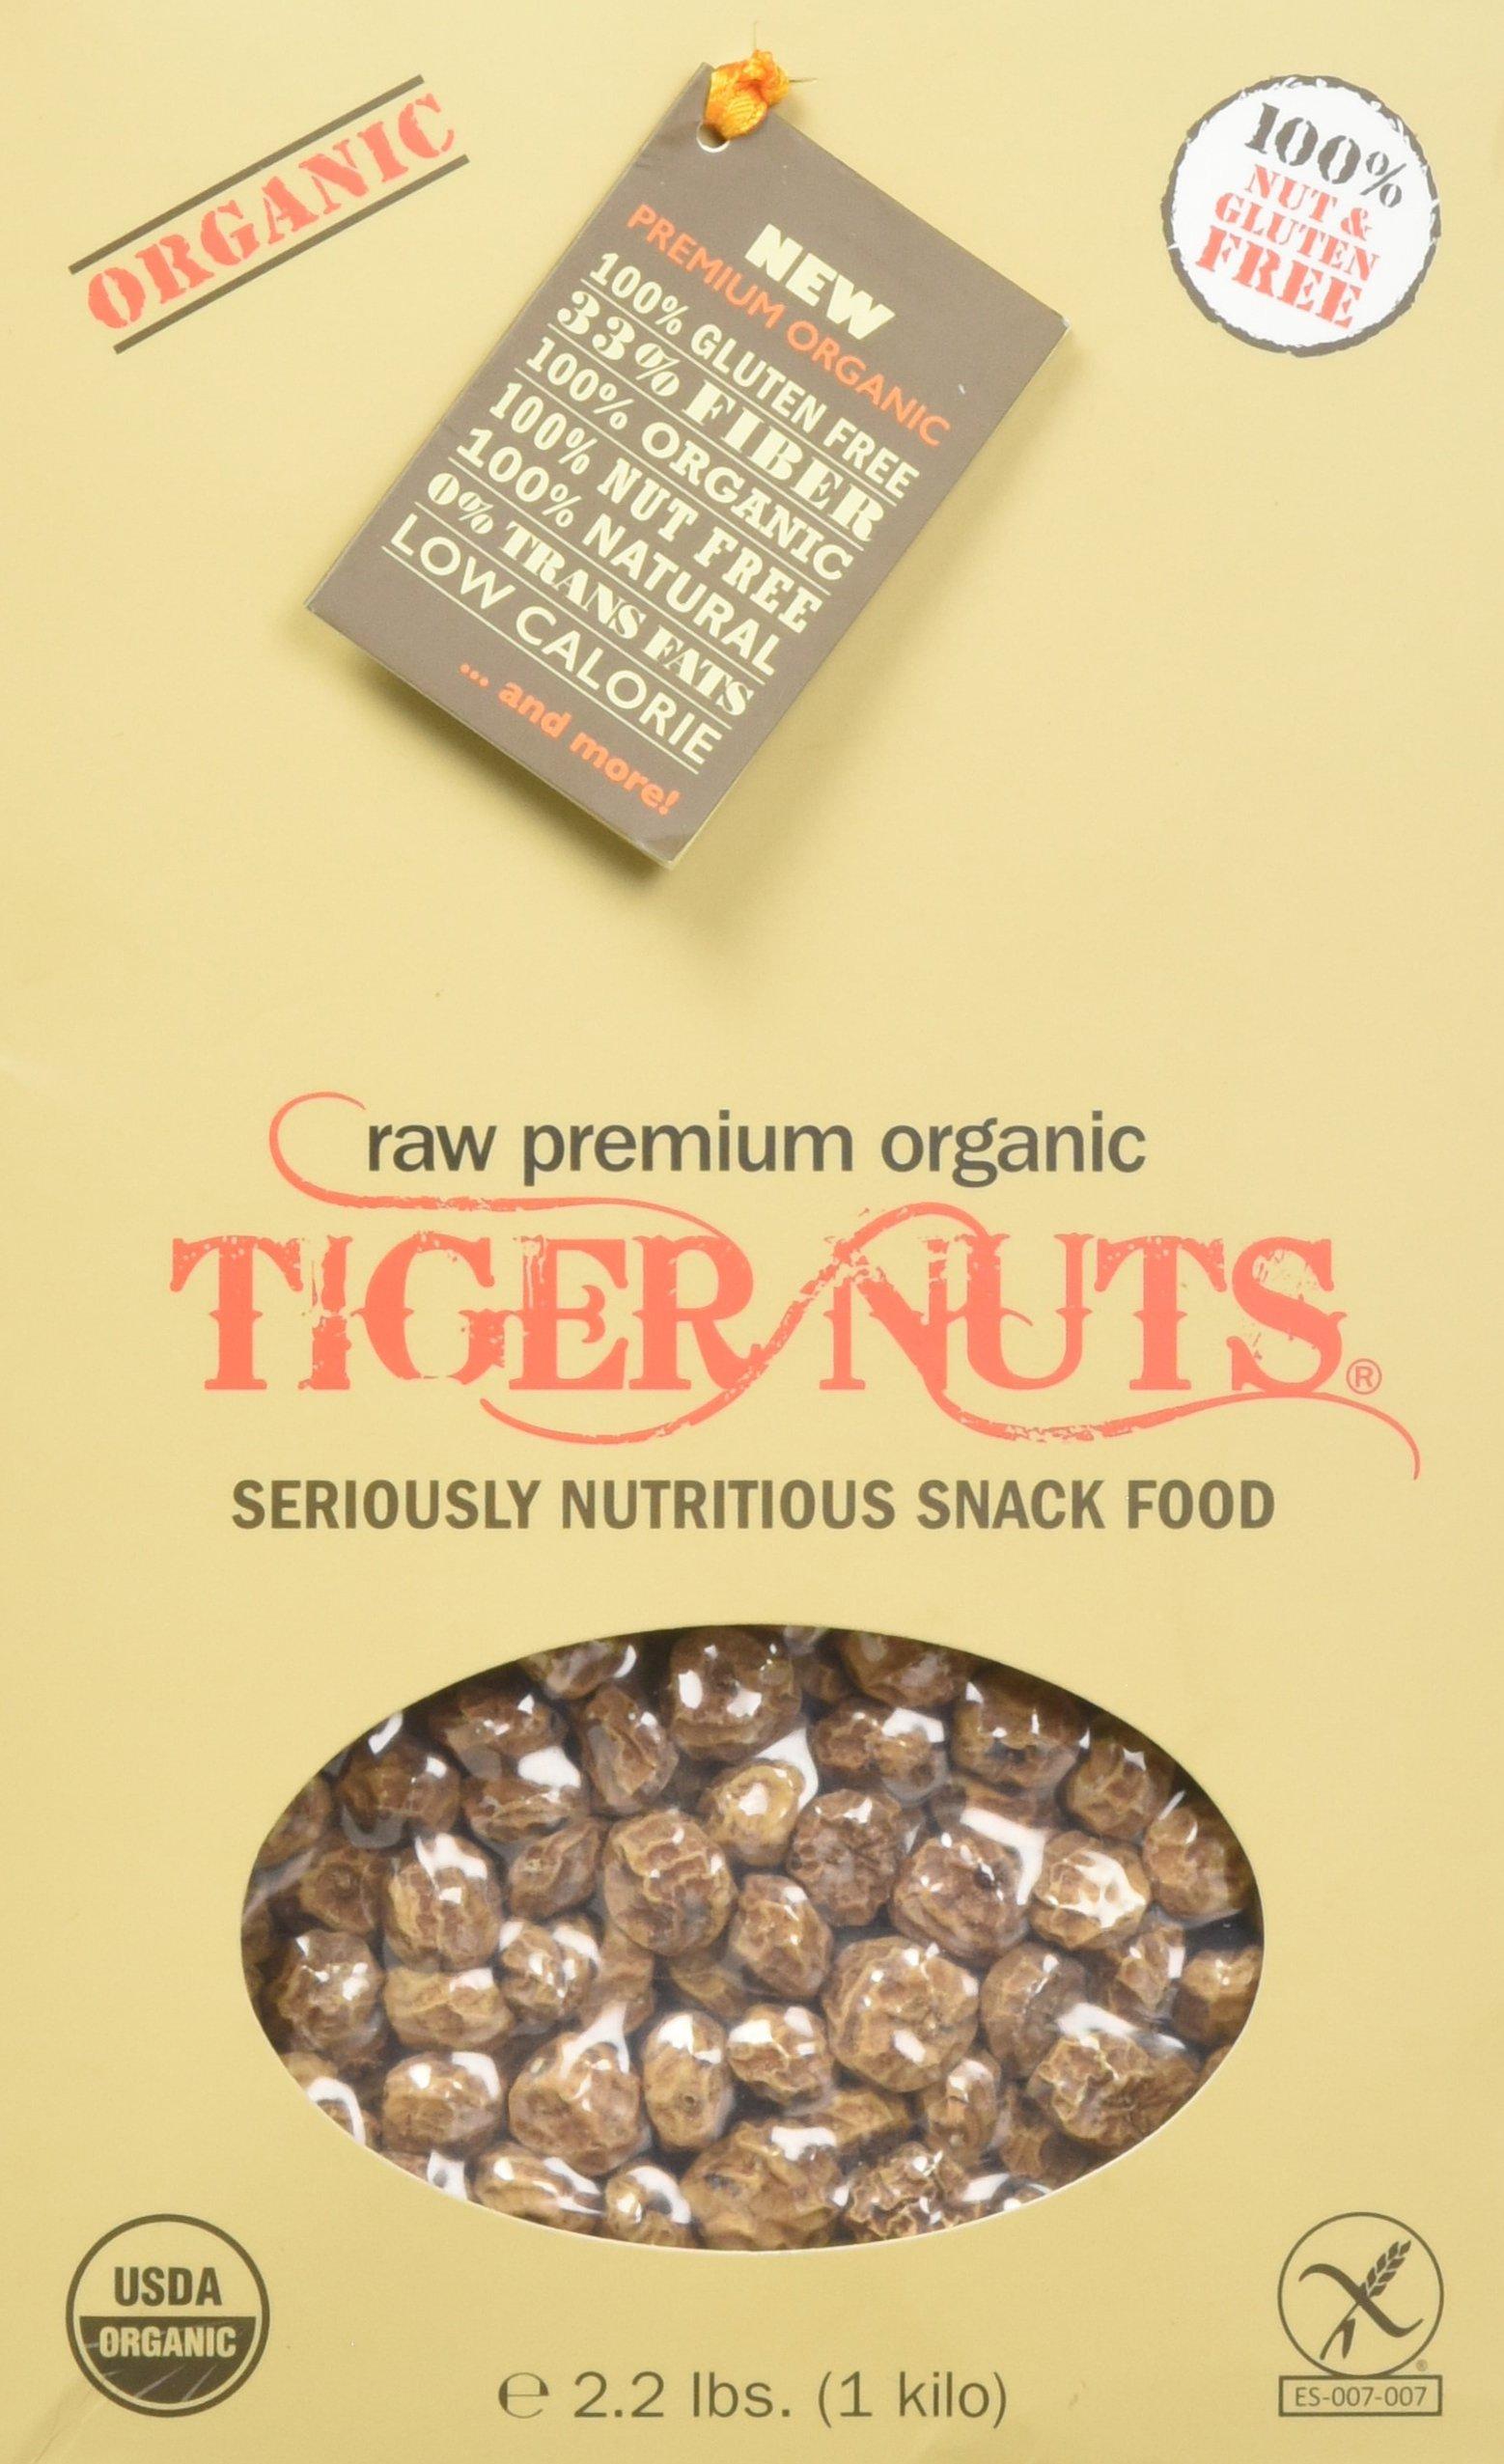 TIGER NUTS - Premium Organic 1 Kilo (2.2 lbs)